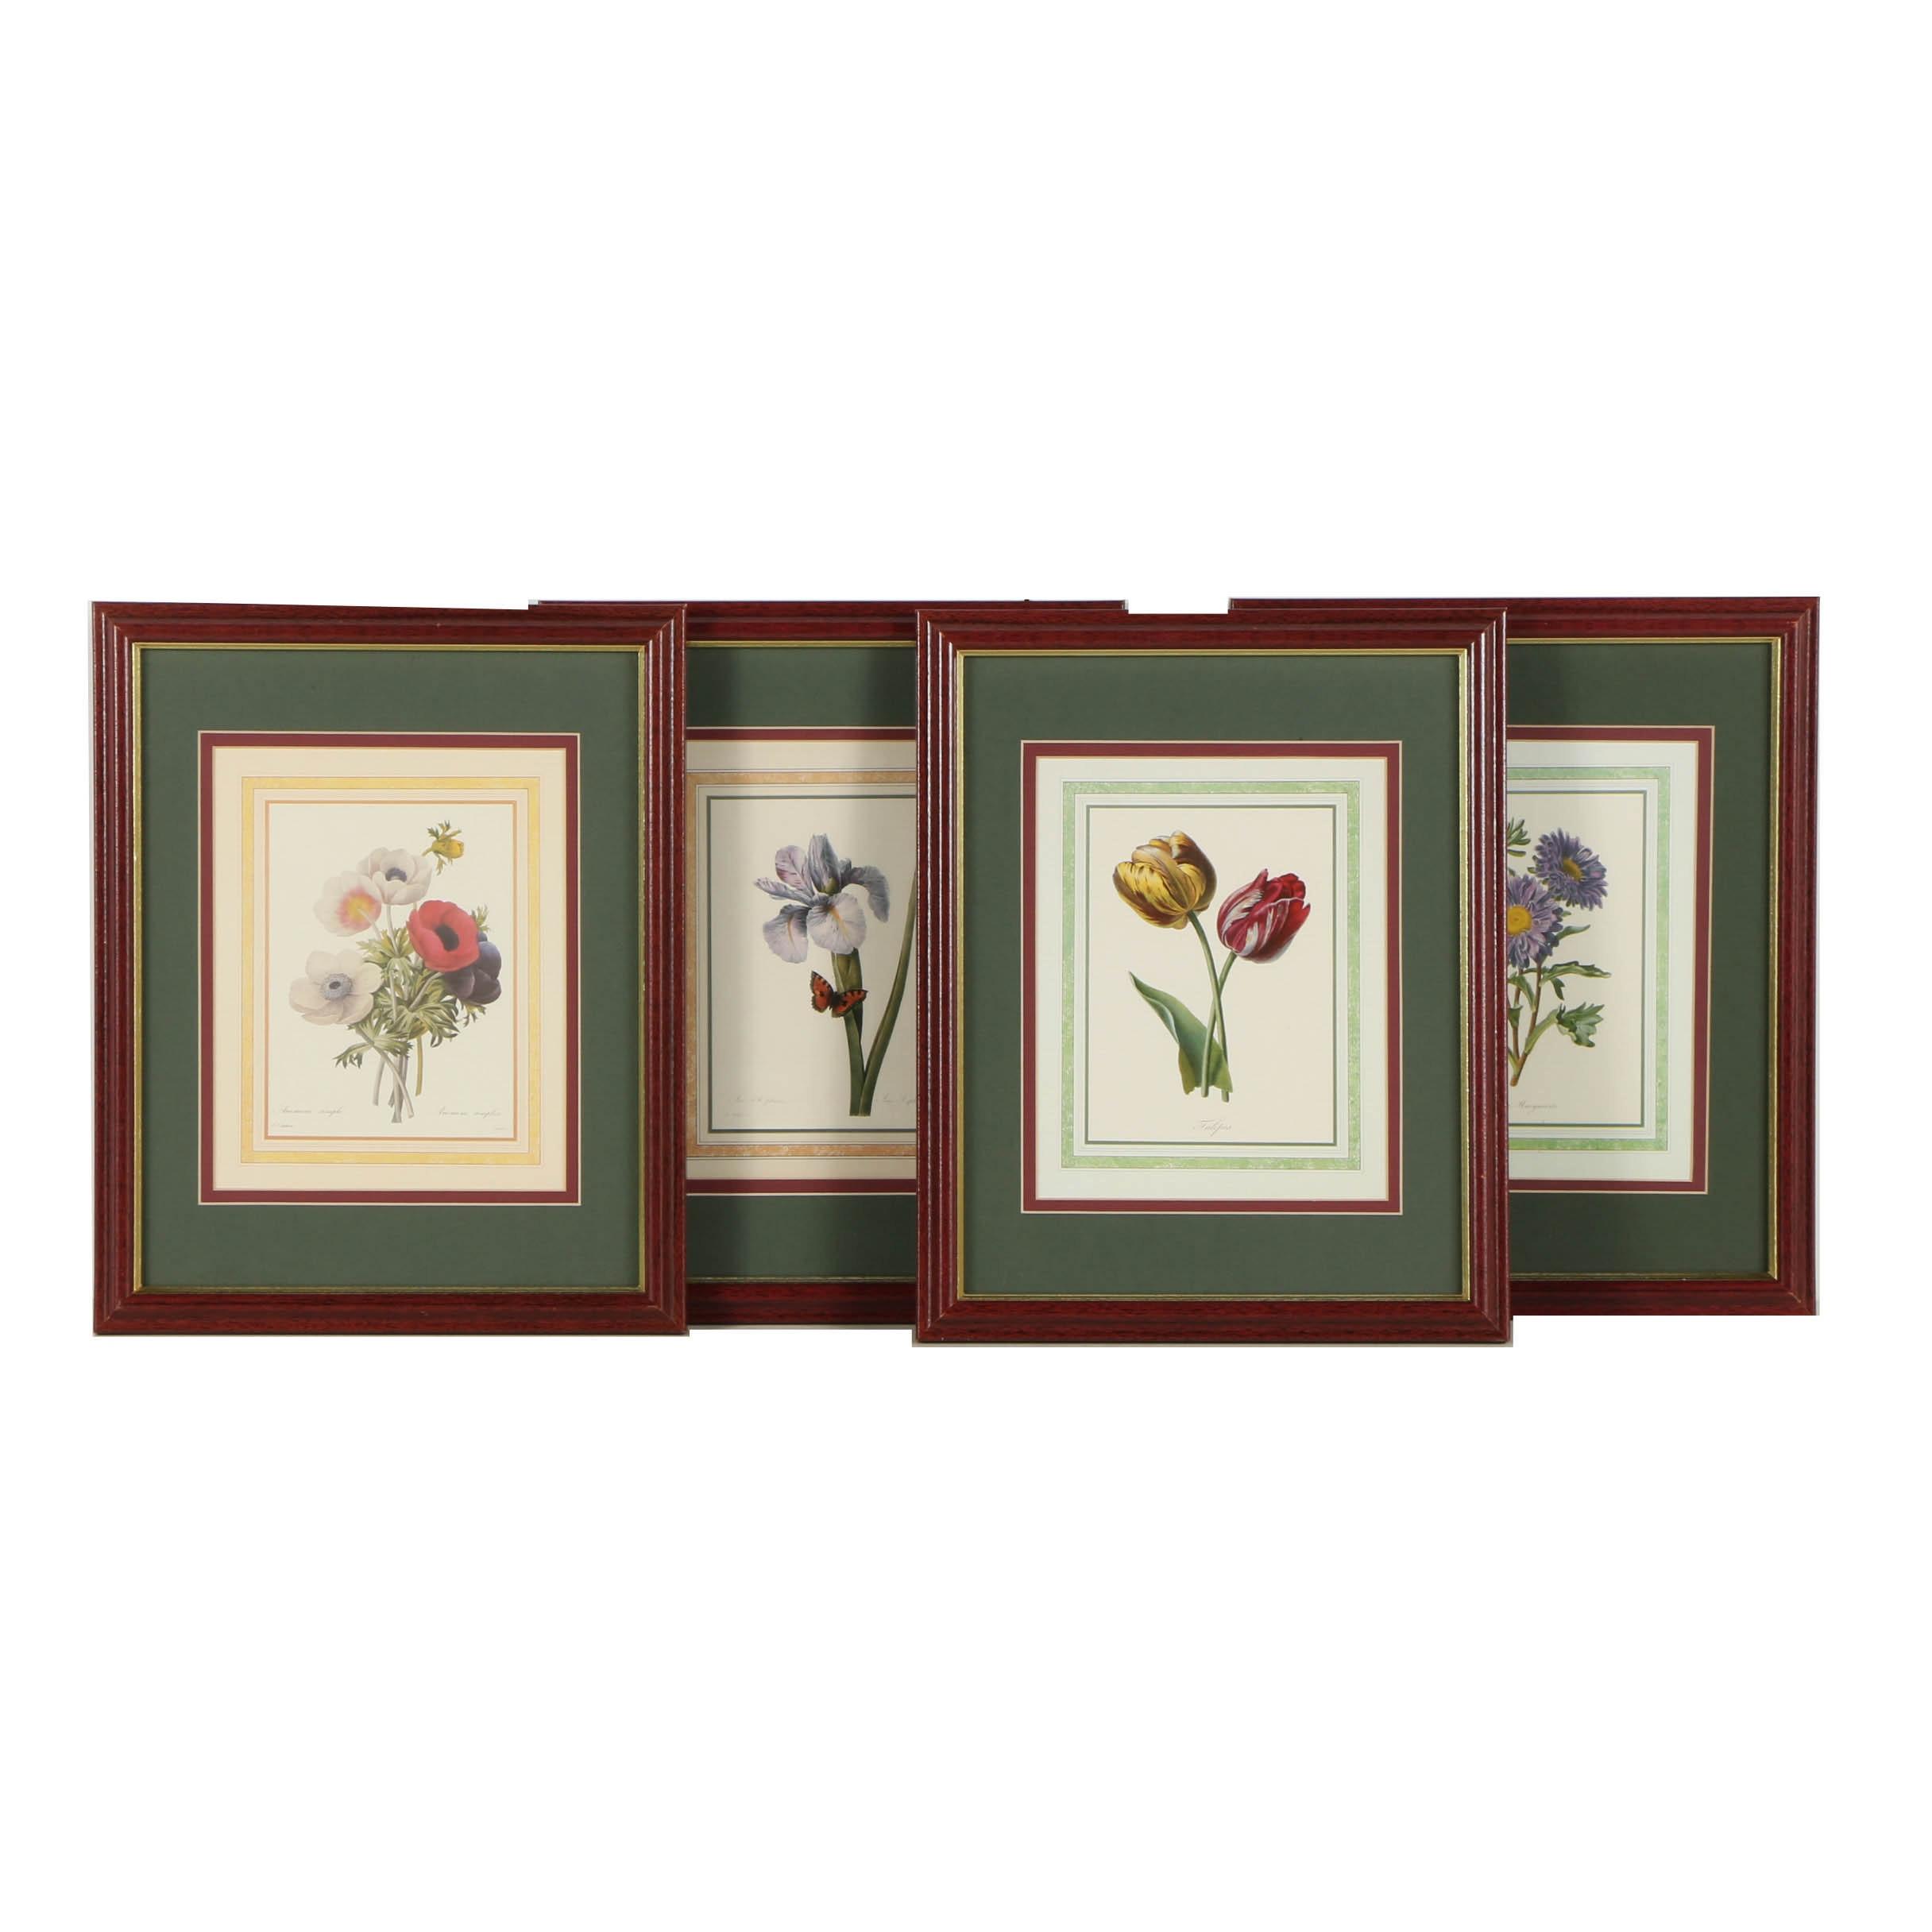 Offset Lithographs of Botanical Illustrations After Pierre-Joseph Redouté